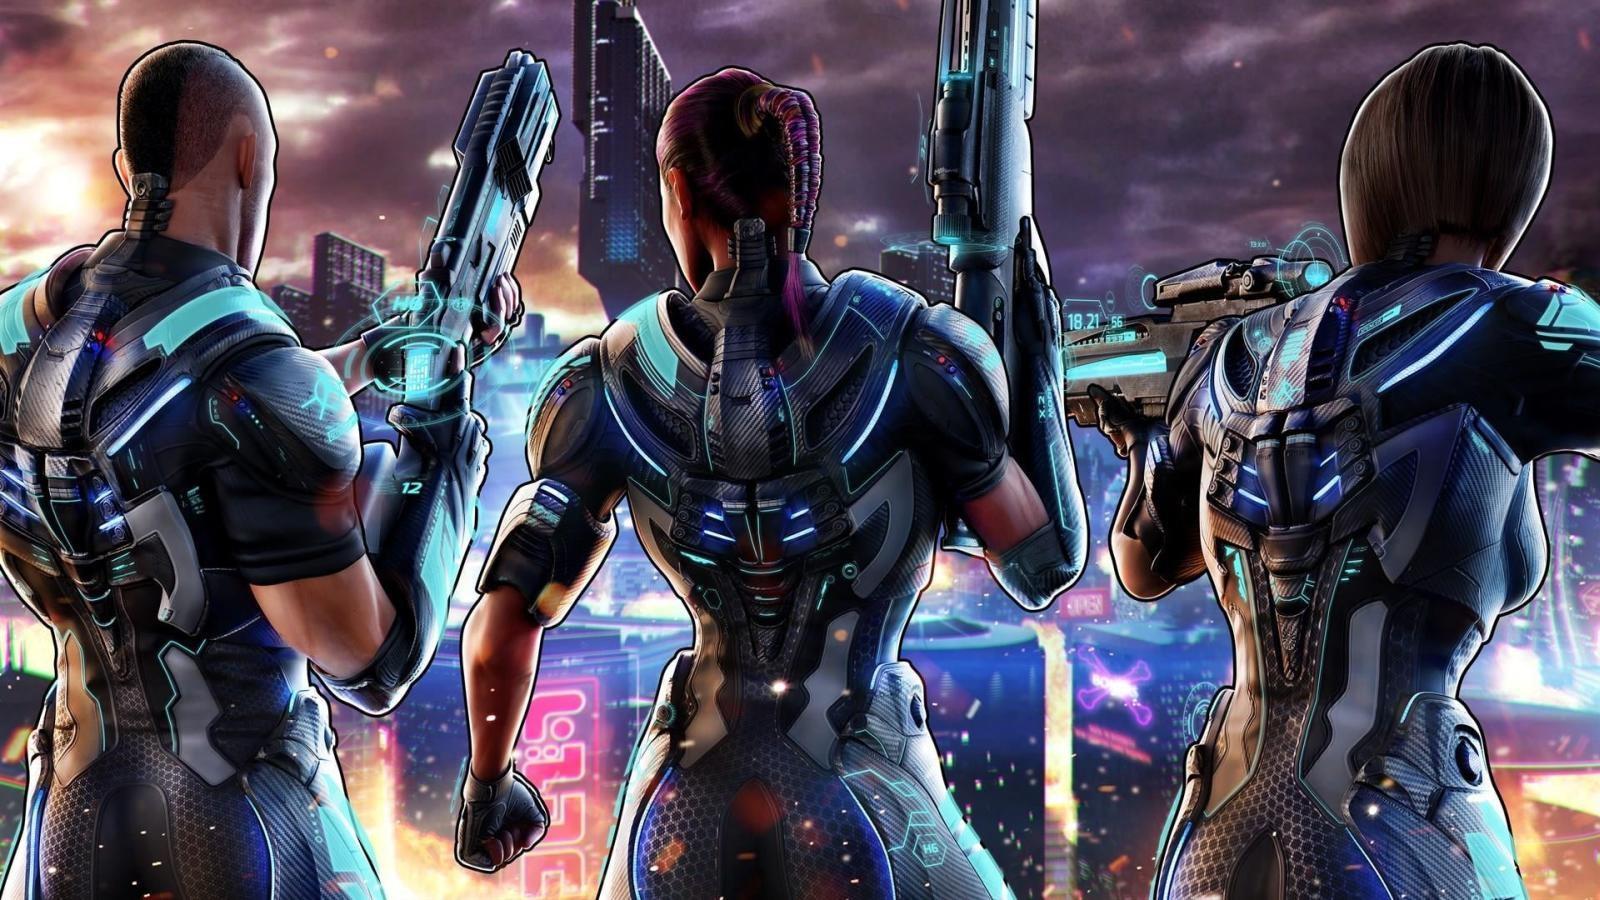 Crackdown 3; screenshot: multiplayer, cover